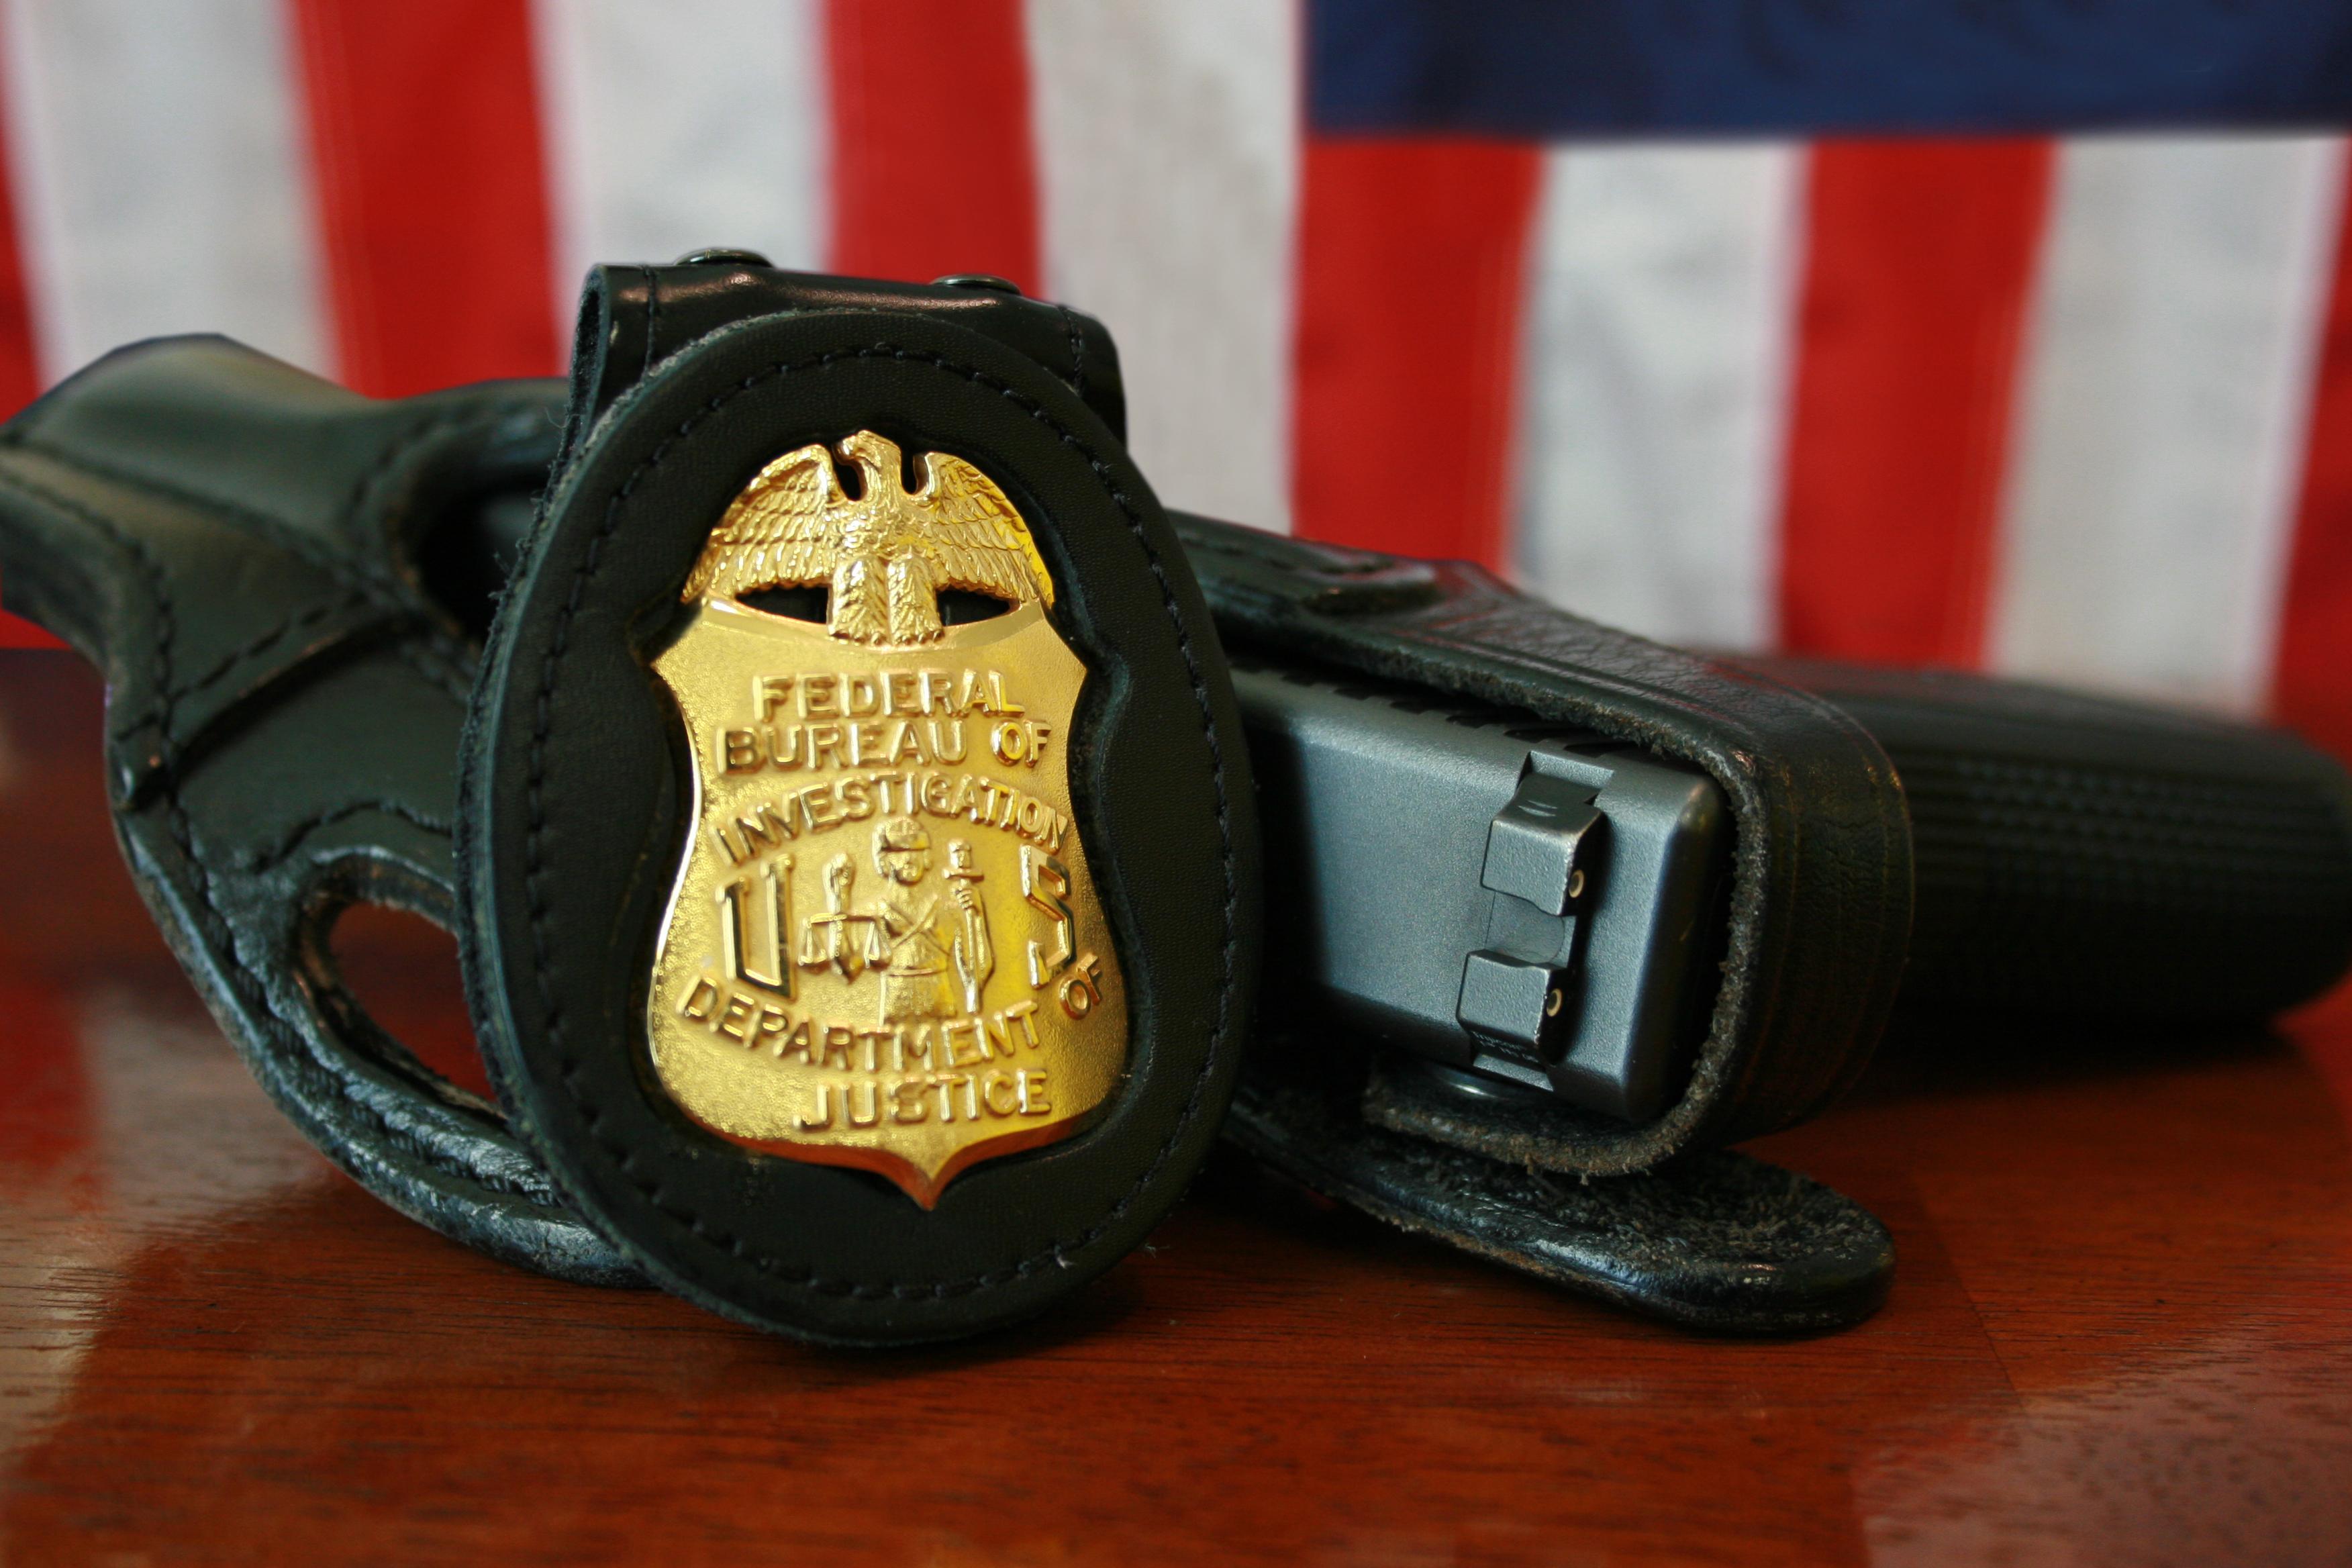 FBI_-Federal_Burea_-of_Investigation